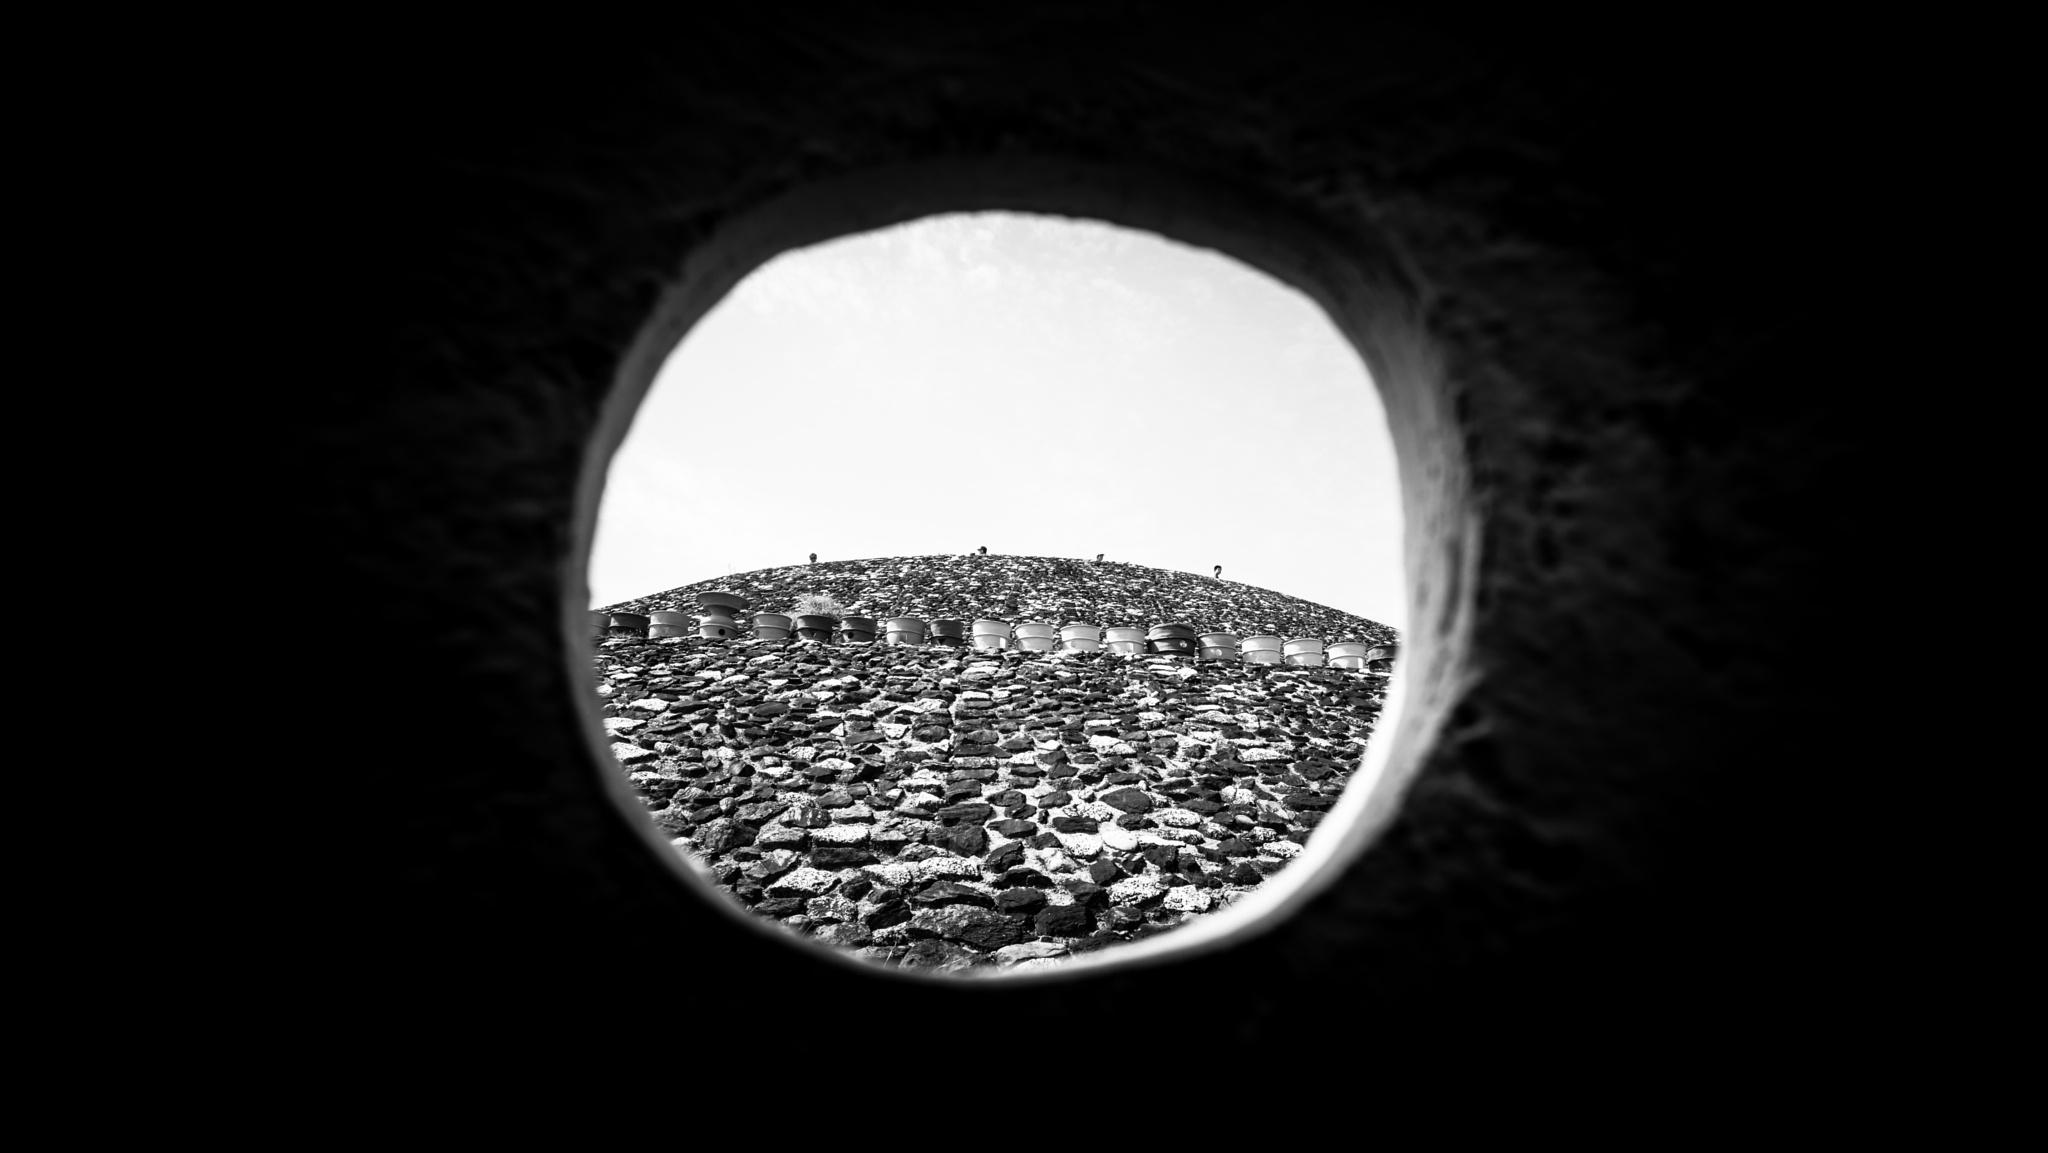 Peephole by muteking